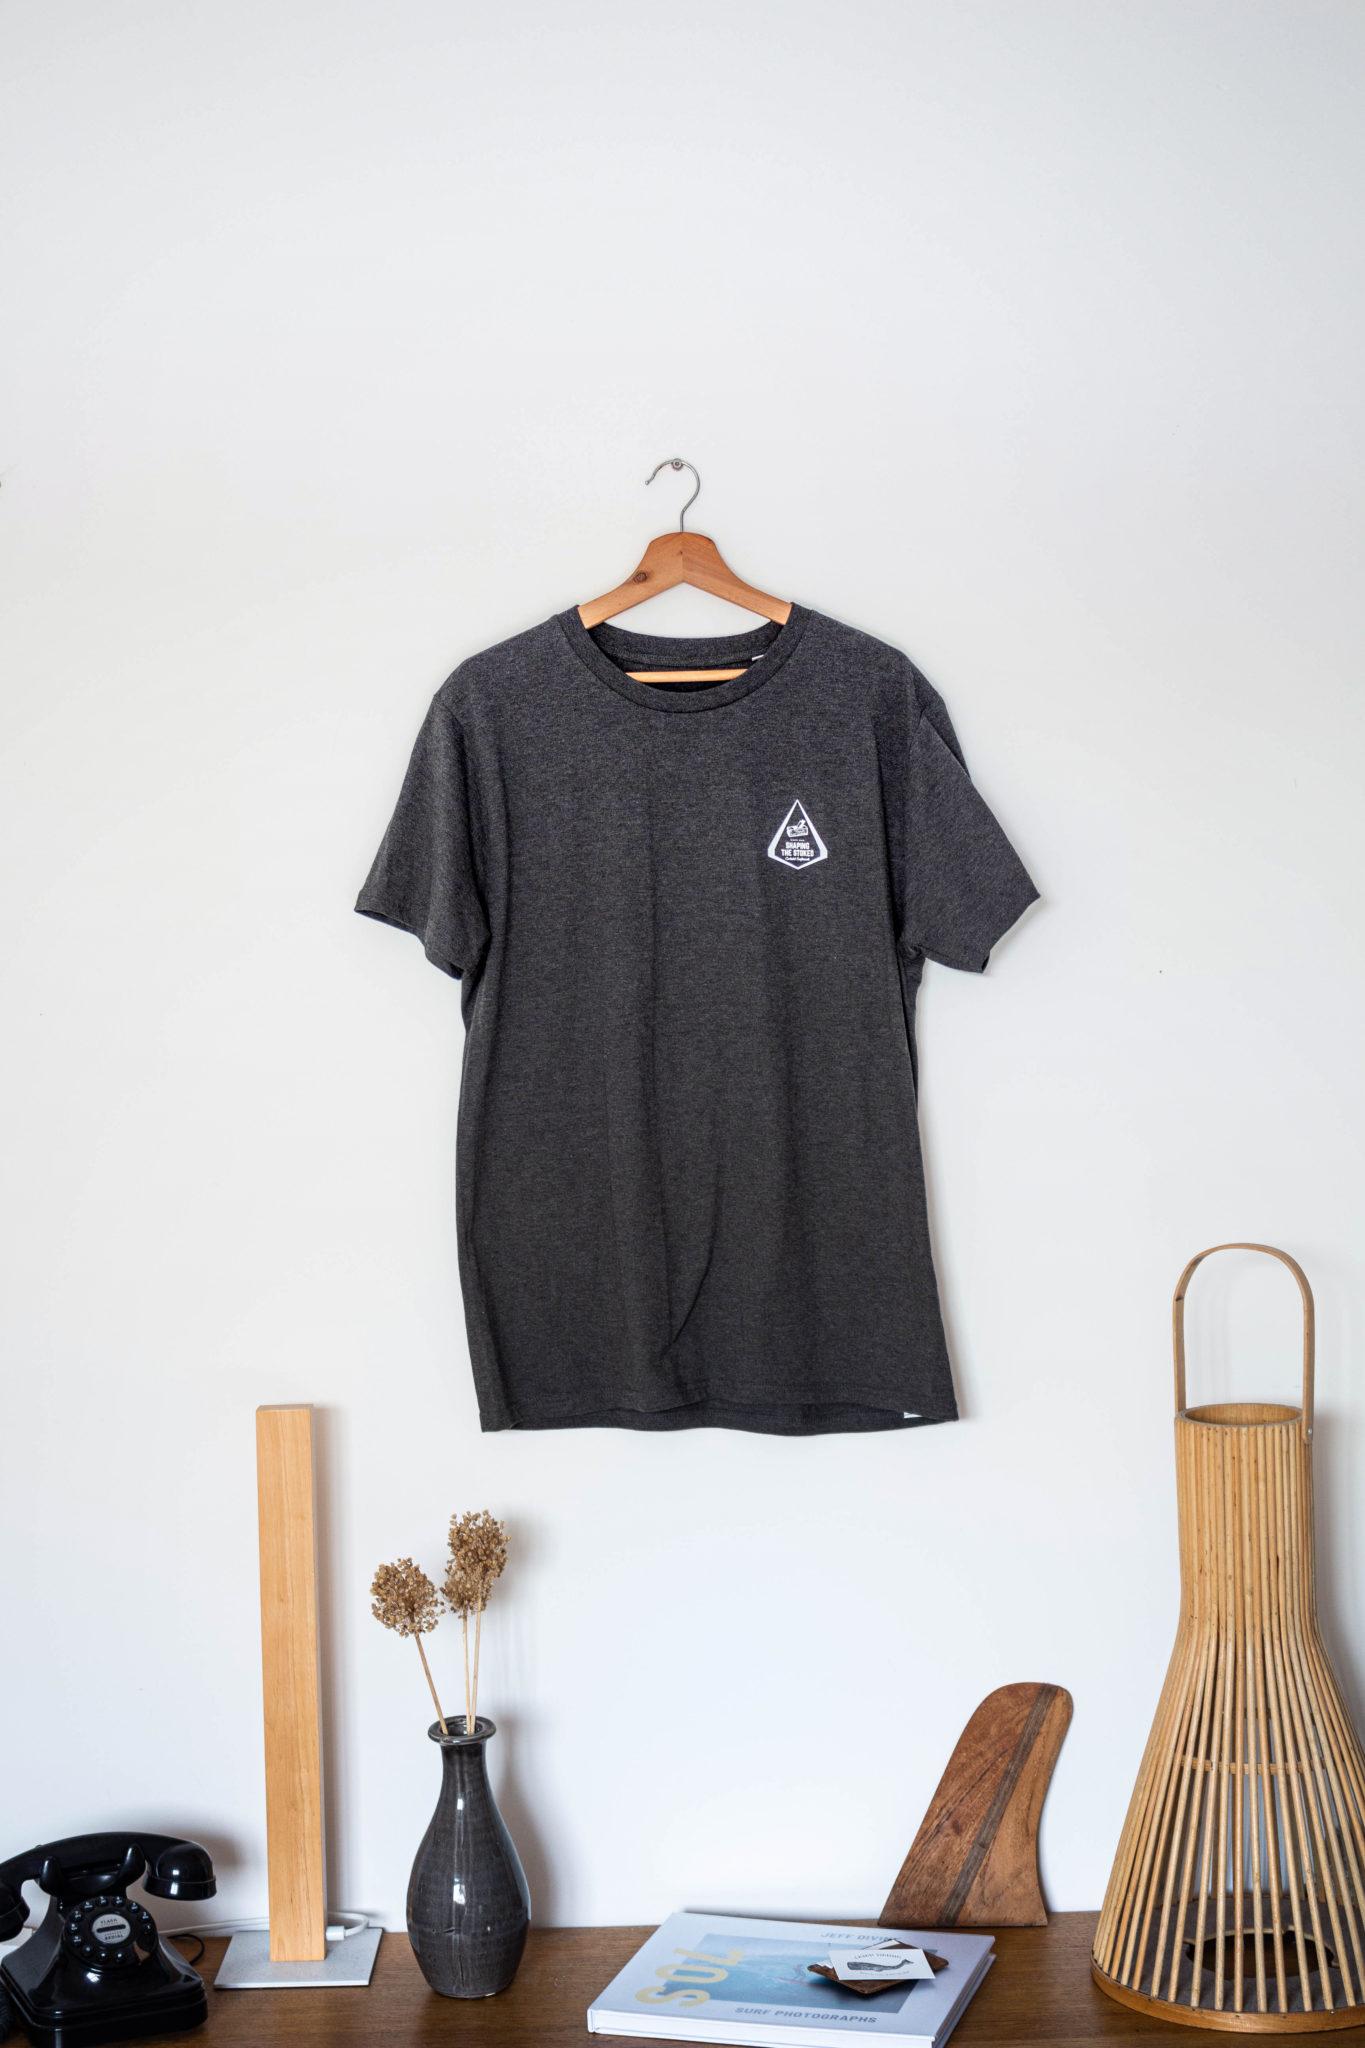 Cachalot Surfboards planche surf handmade artisan shaper hollow wooden collection textile teeshirt